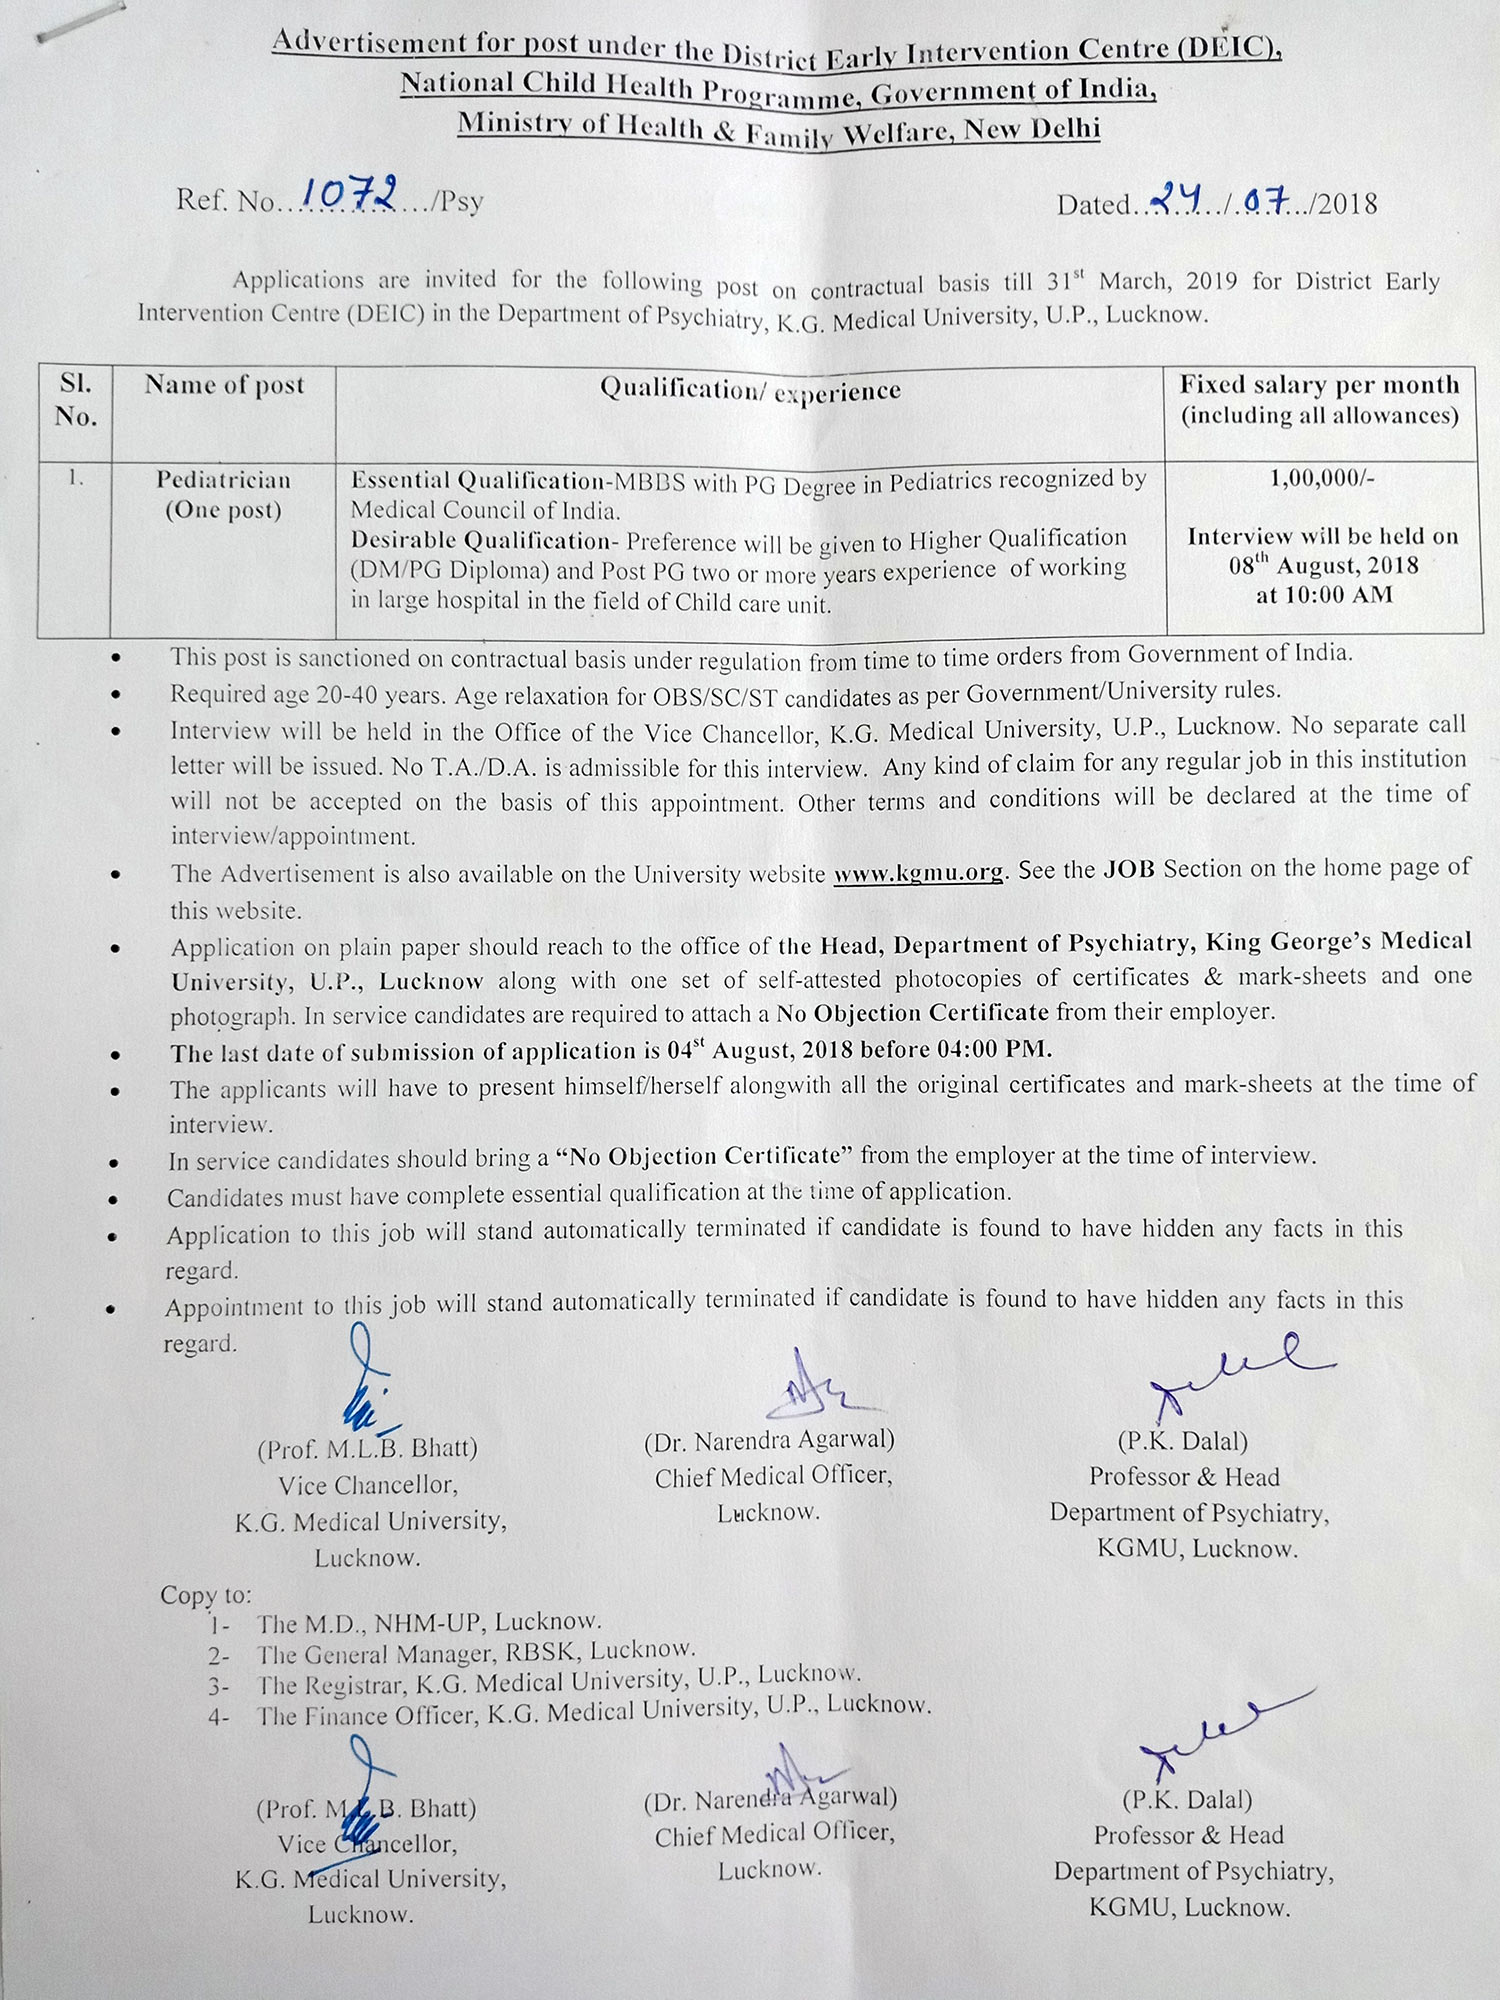 King George\'s Medical University, Chowk, Lucknow U.P. INDIA